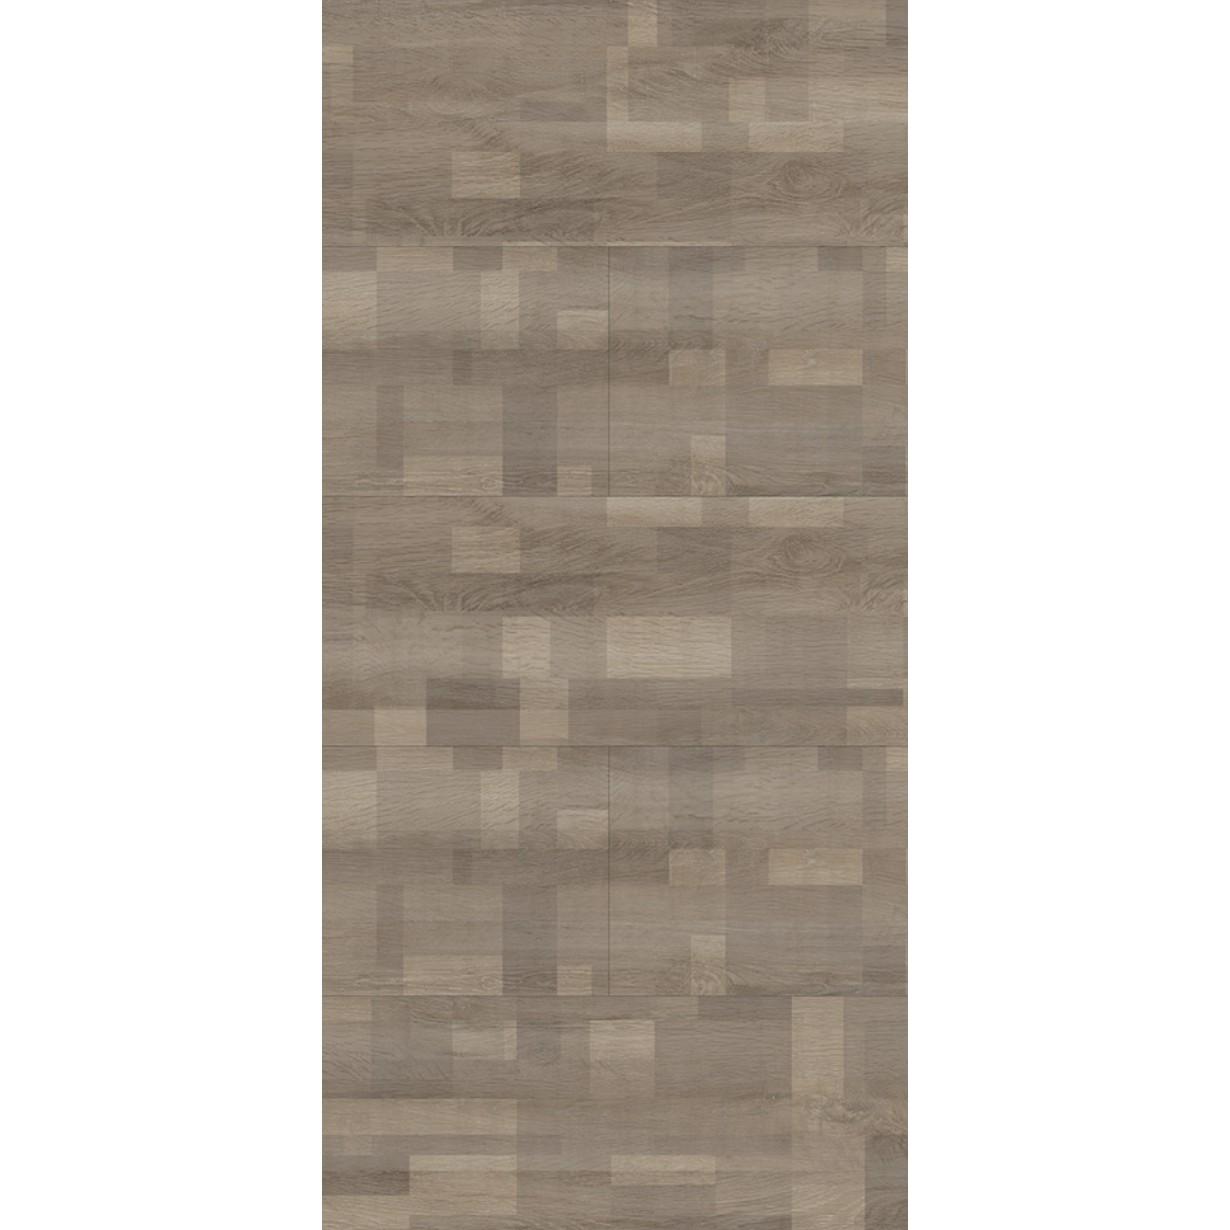 Piso Laminado 27 x 137 cm Ultra Strett Nassau 2326 m - Durafloor